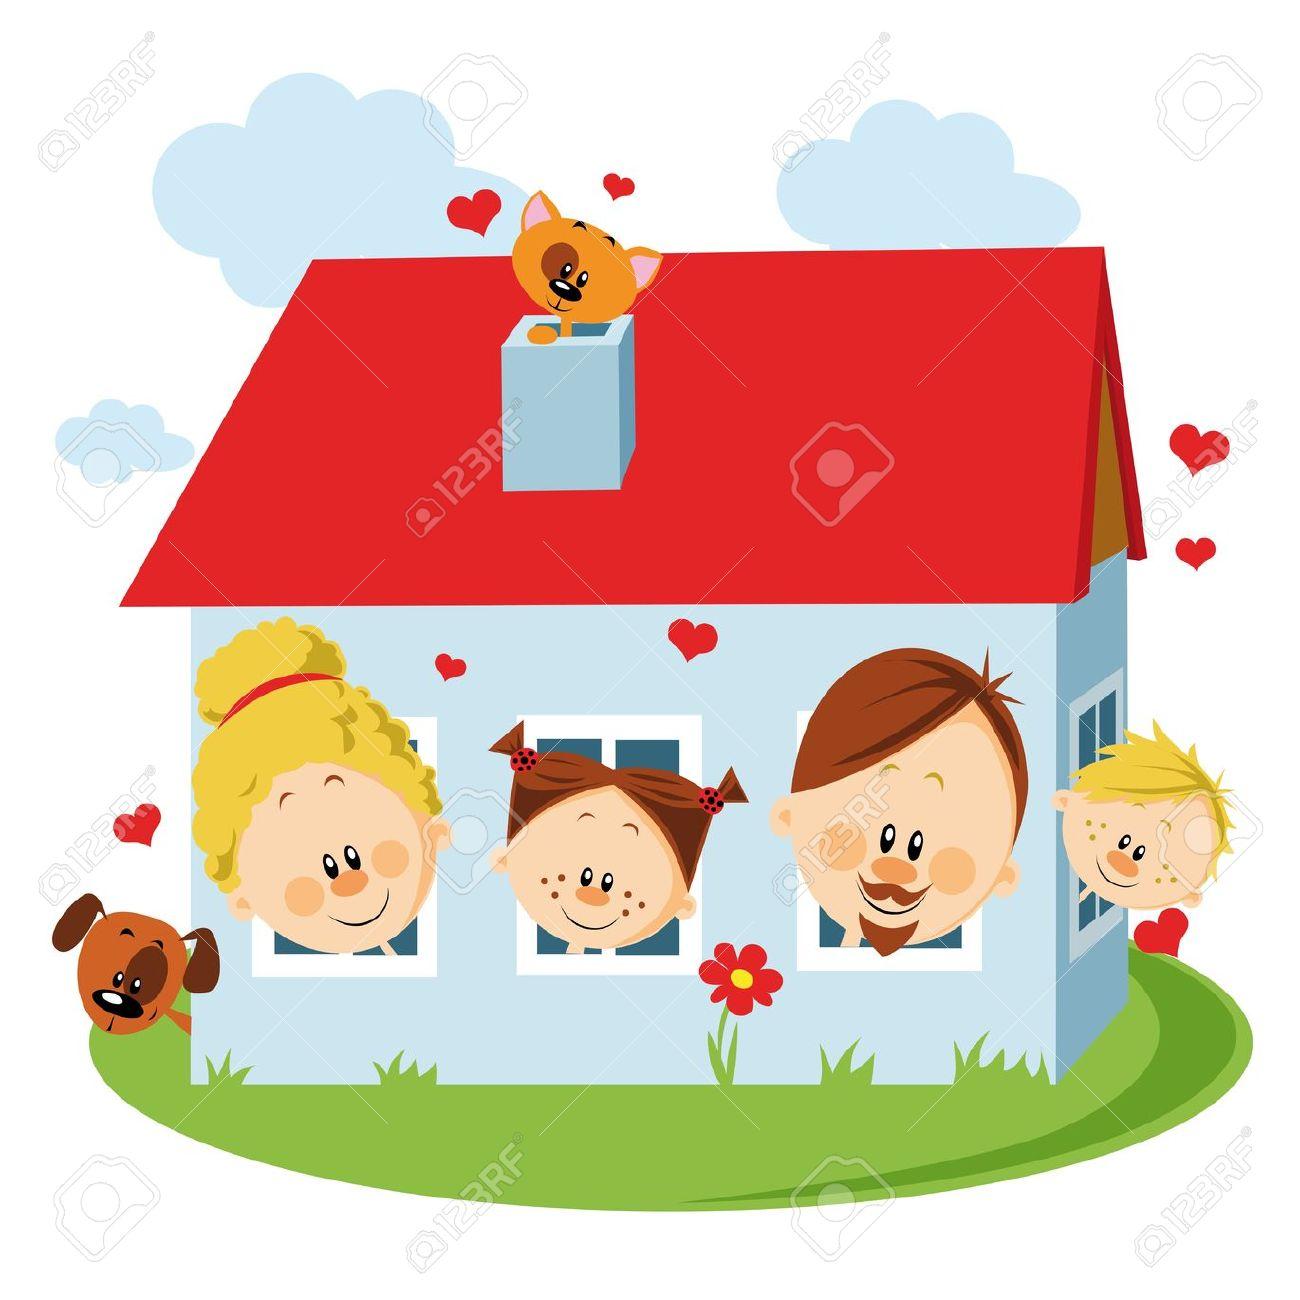 Haus mit garten clipart image stock Familie haus clipart - ClipartFest image stock